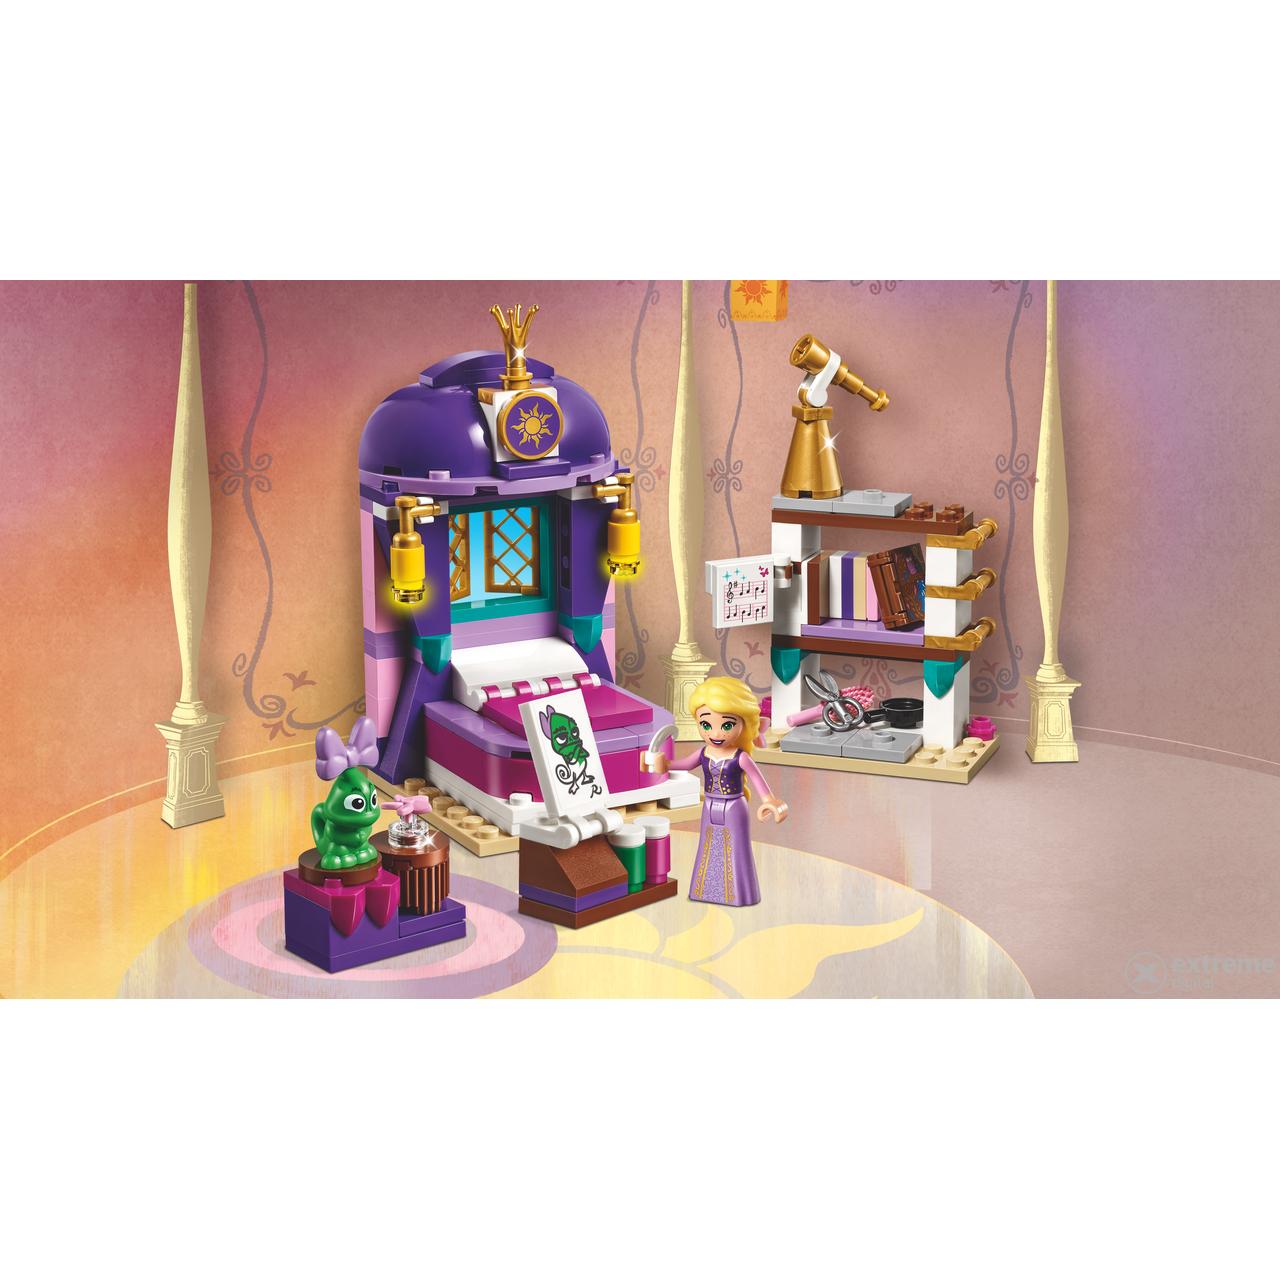 lego174 disney princess rapunzel a jej hradn225 sp225l�a 41156